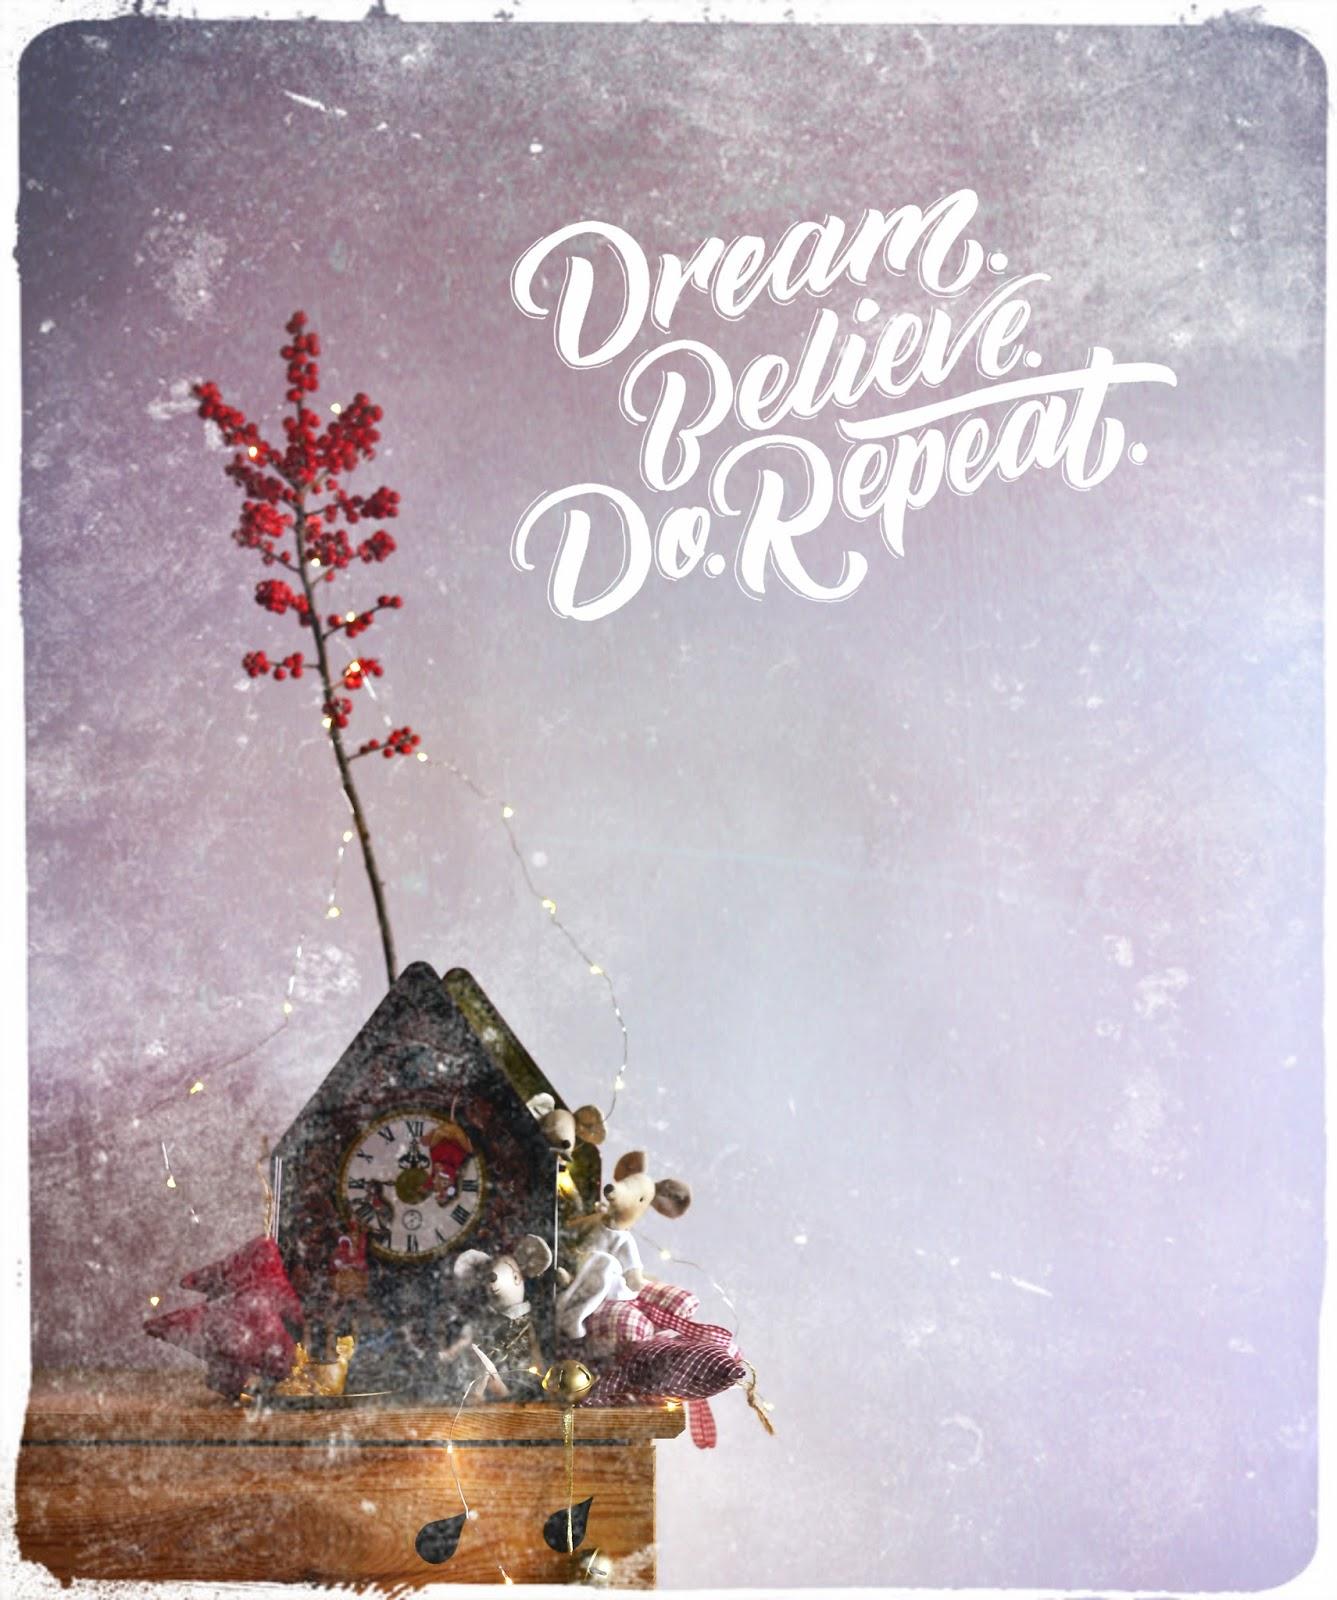 Dream. Believe. Do repeat.